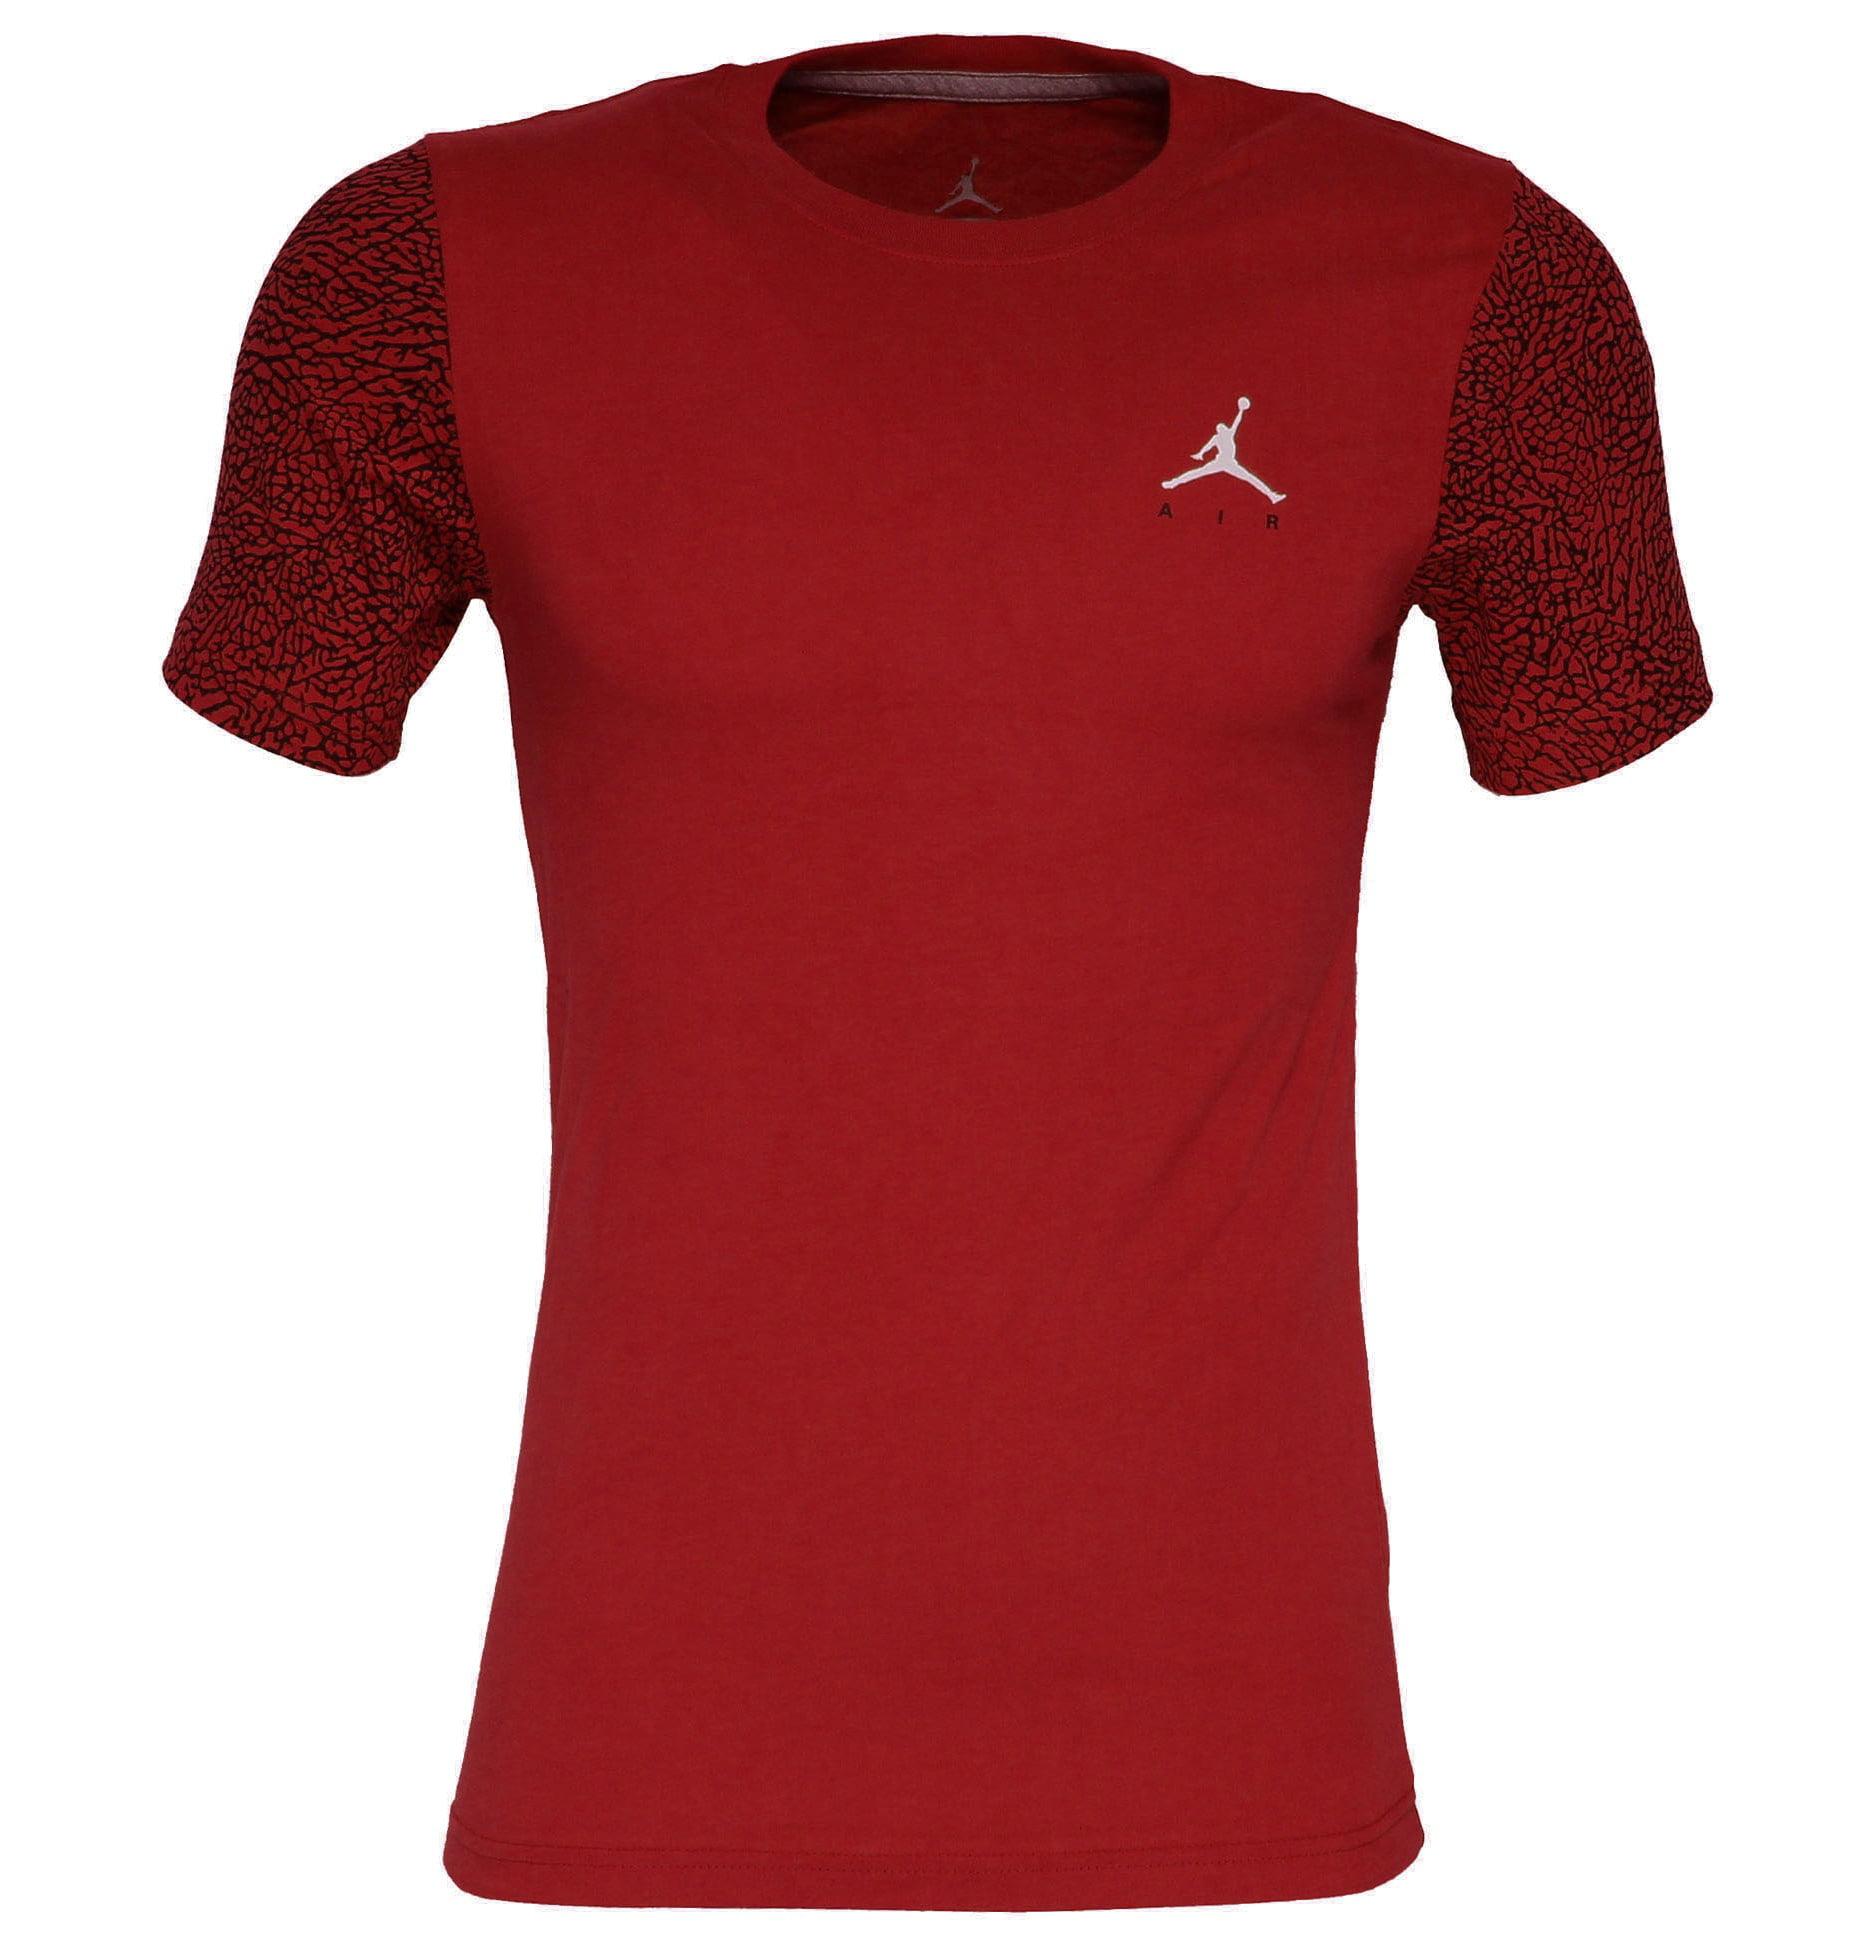 Nike Air Jordan Elephant Sleeve Men's T-Shirt Large